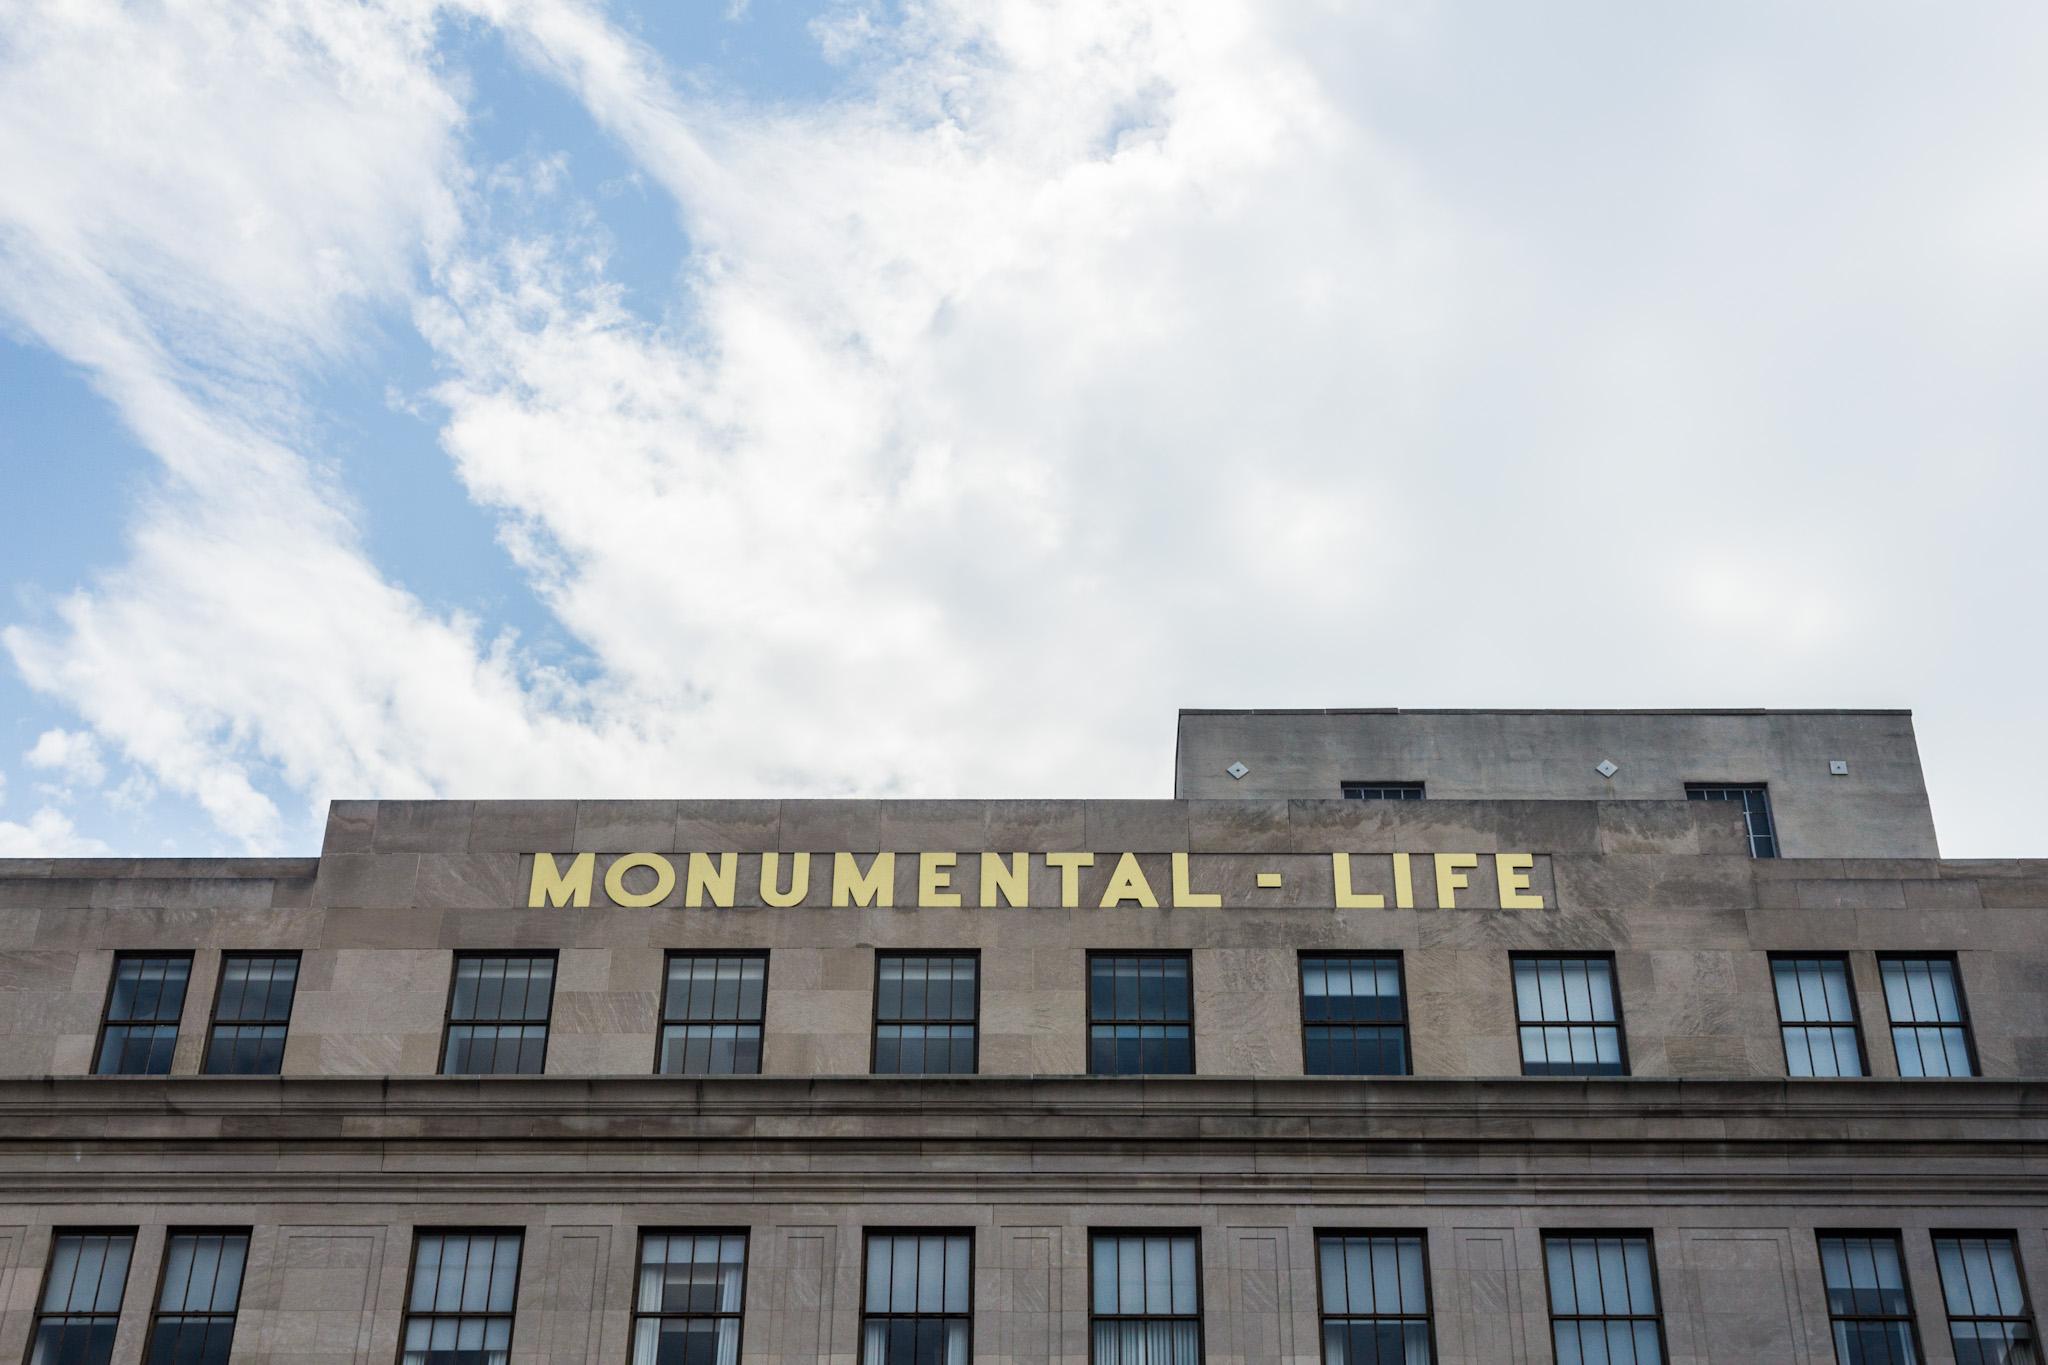 Monumental Life